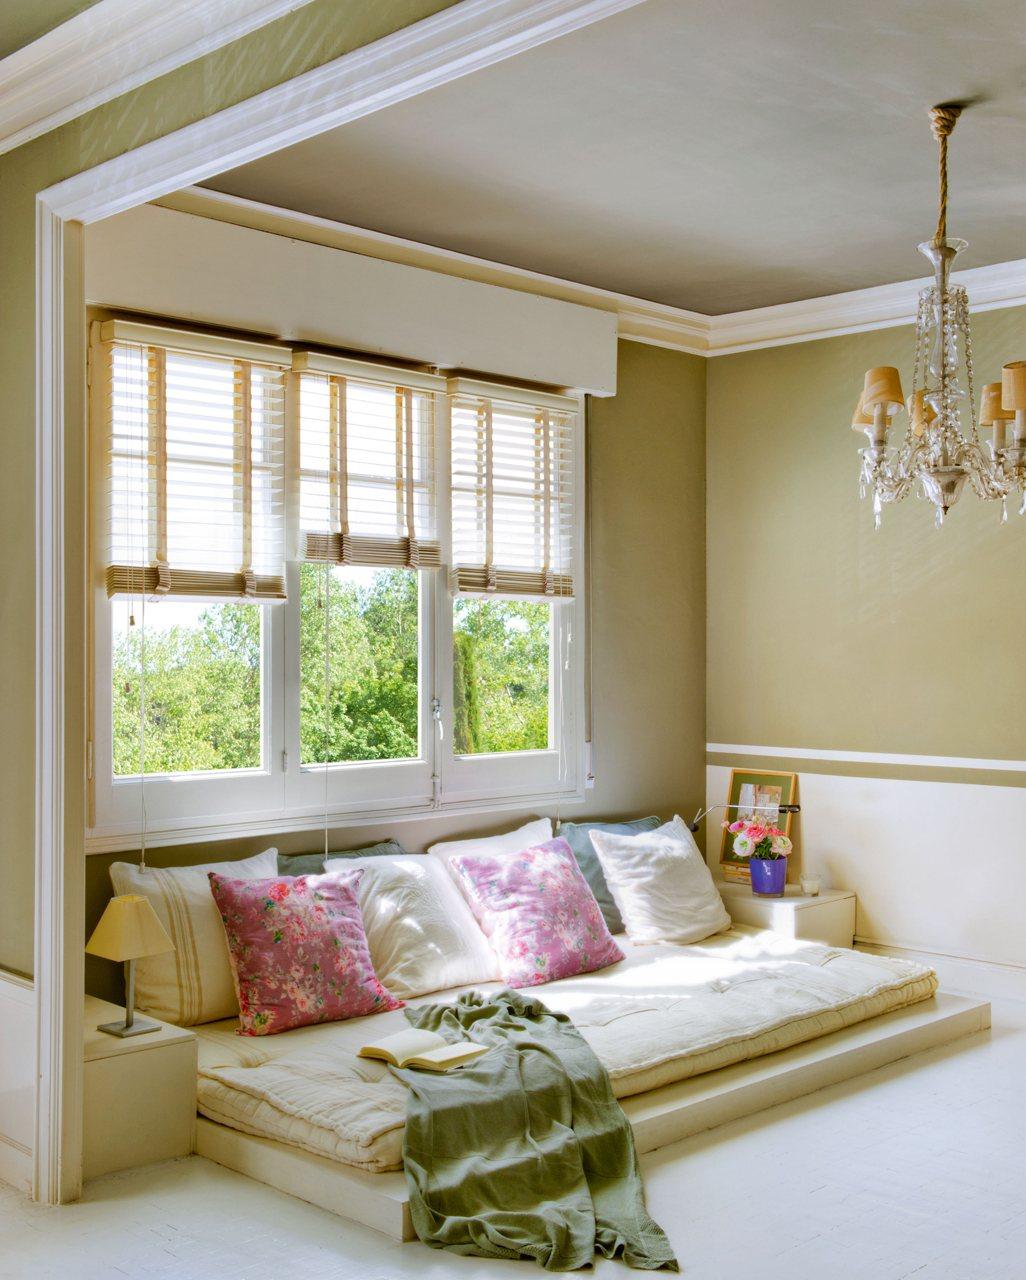 living room mattress india pop ceiling design for ideas low cost de una estilista para renovar un piso con ...